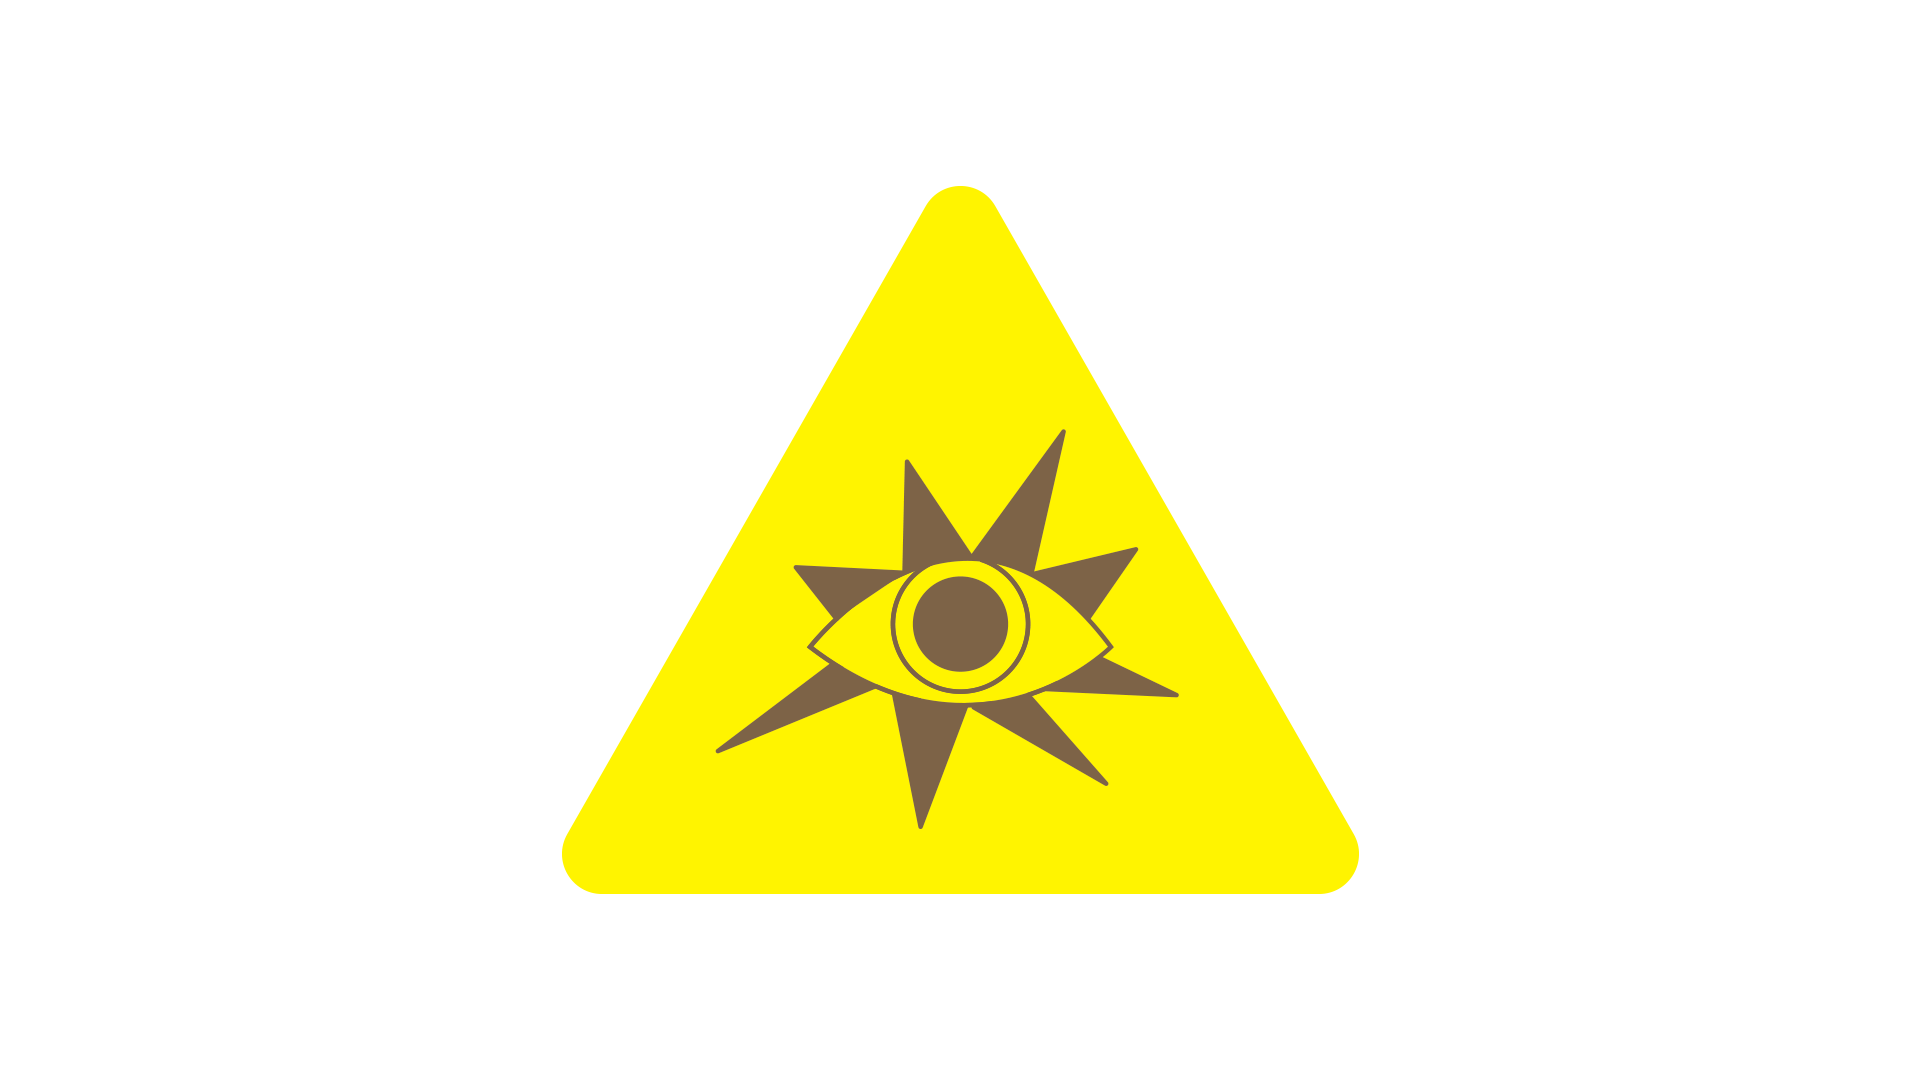 access-optic-protection-mechanique